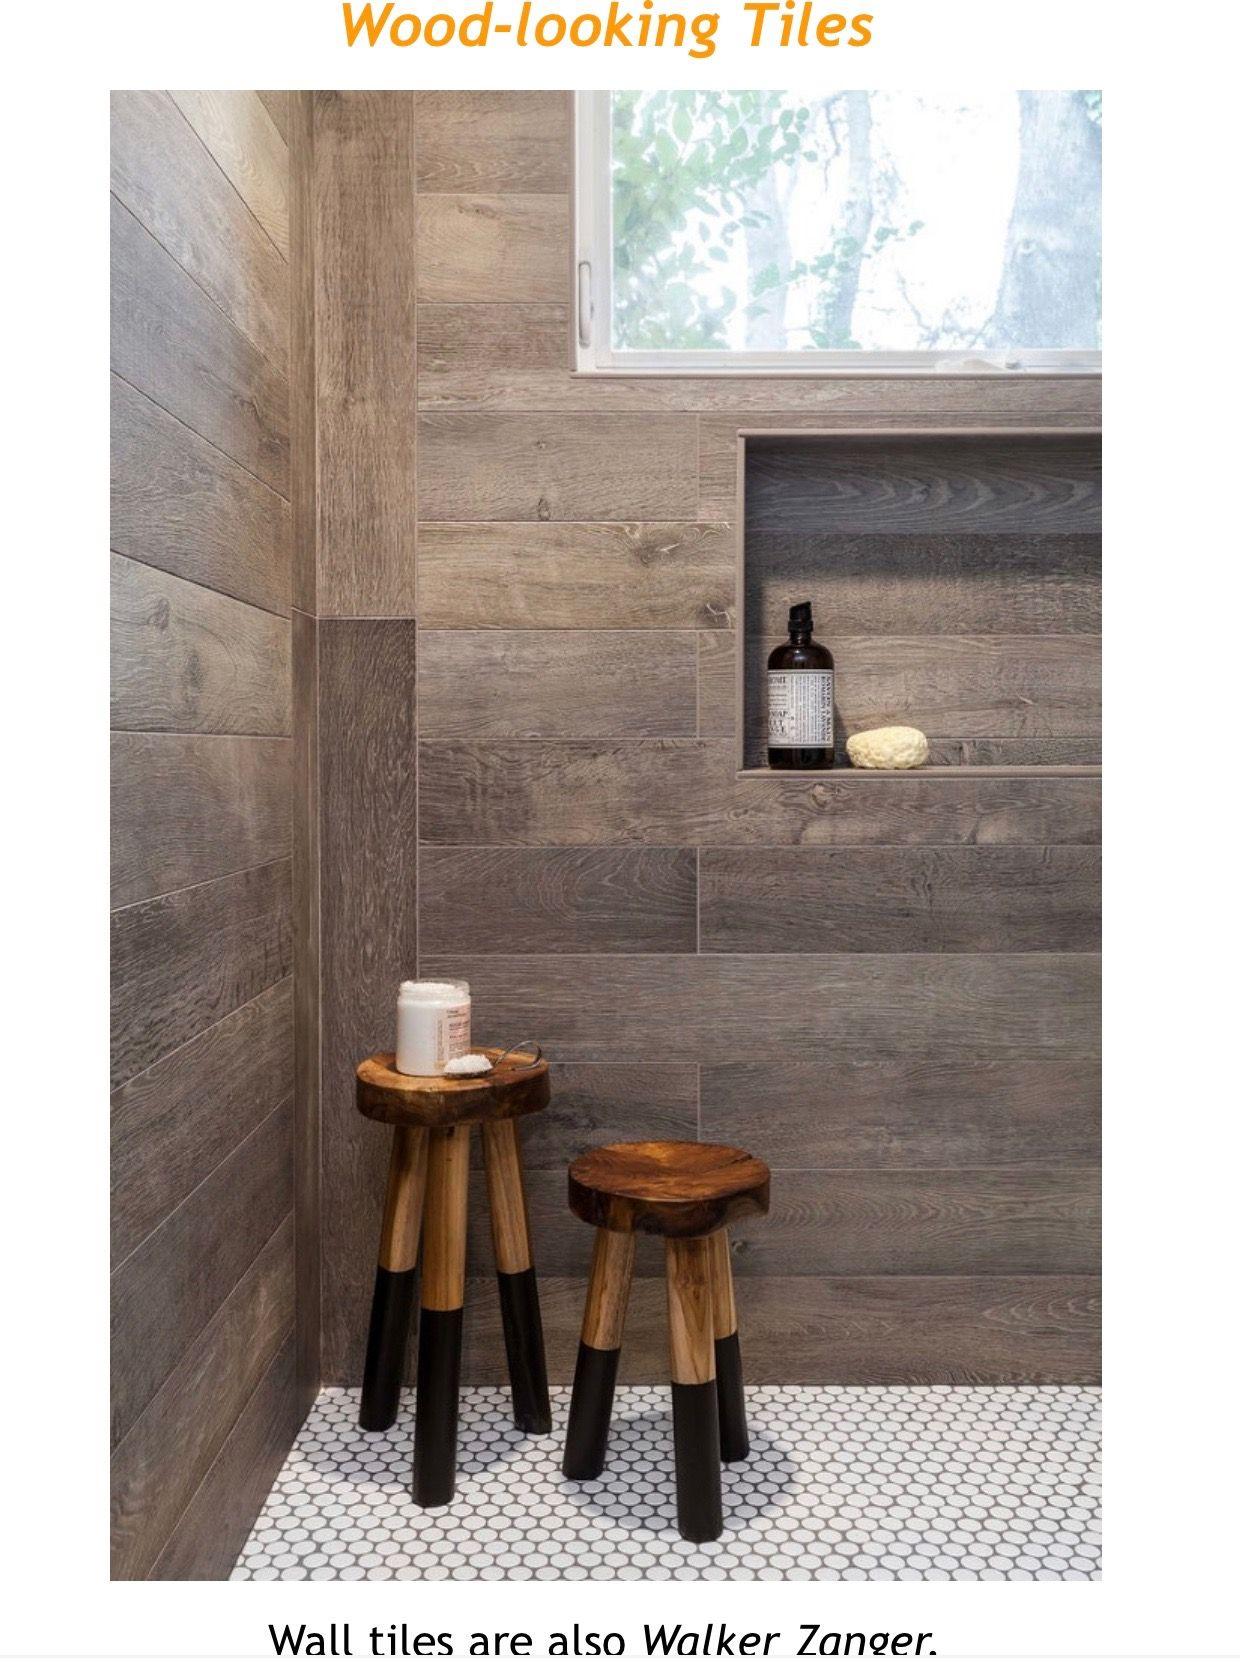 Pin By Christy Pilkington On Tile Ideas Wood Tile Bathroom Wood Wall Tiles Wood Tile Bathroom Floor